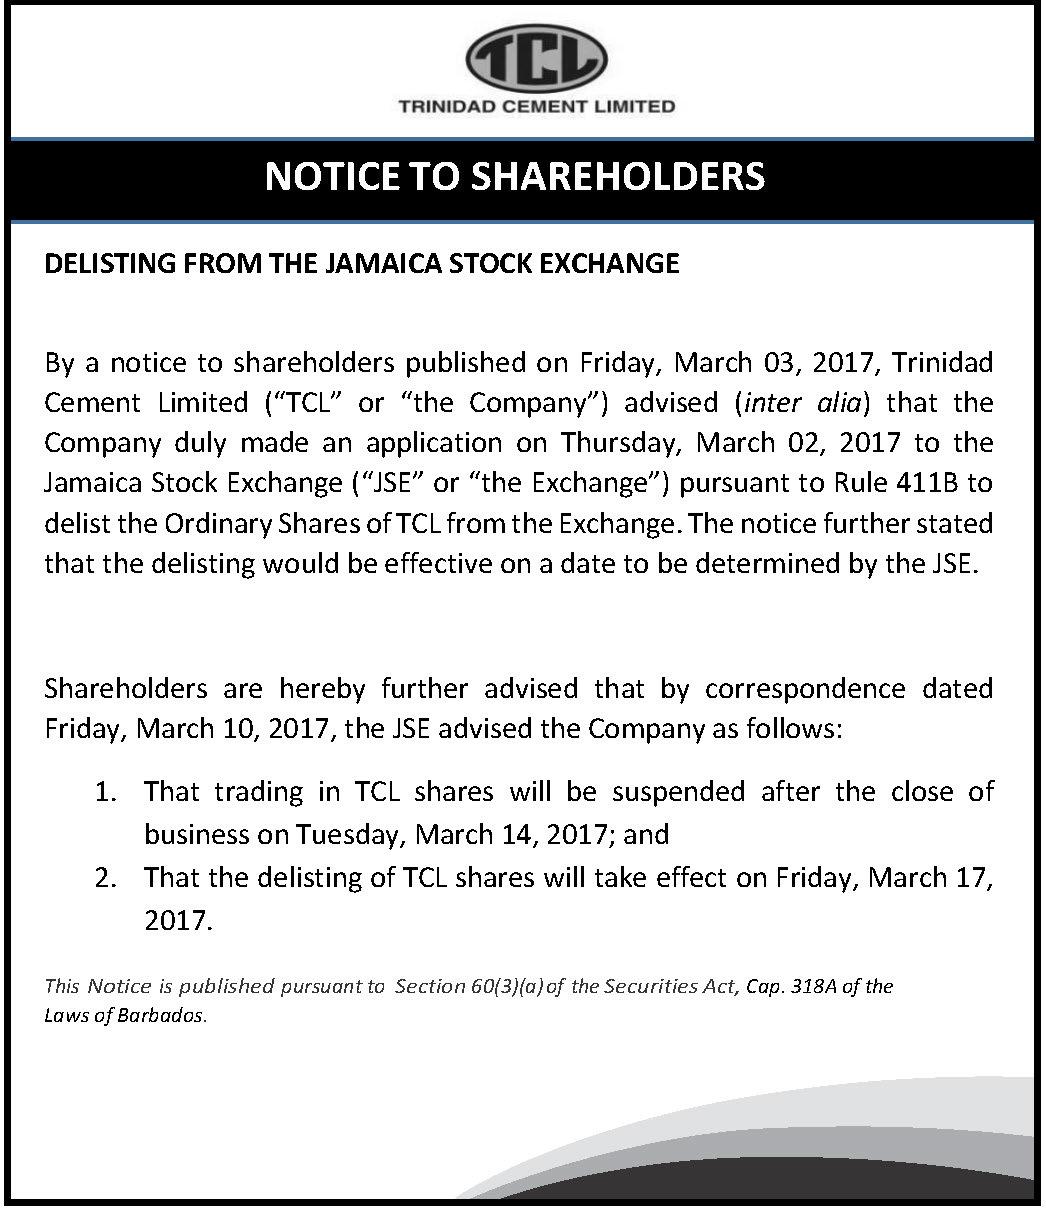 Delisting on Jca stock exchange - Bdos-15x3